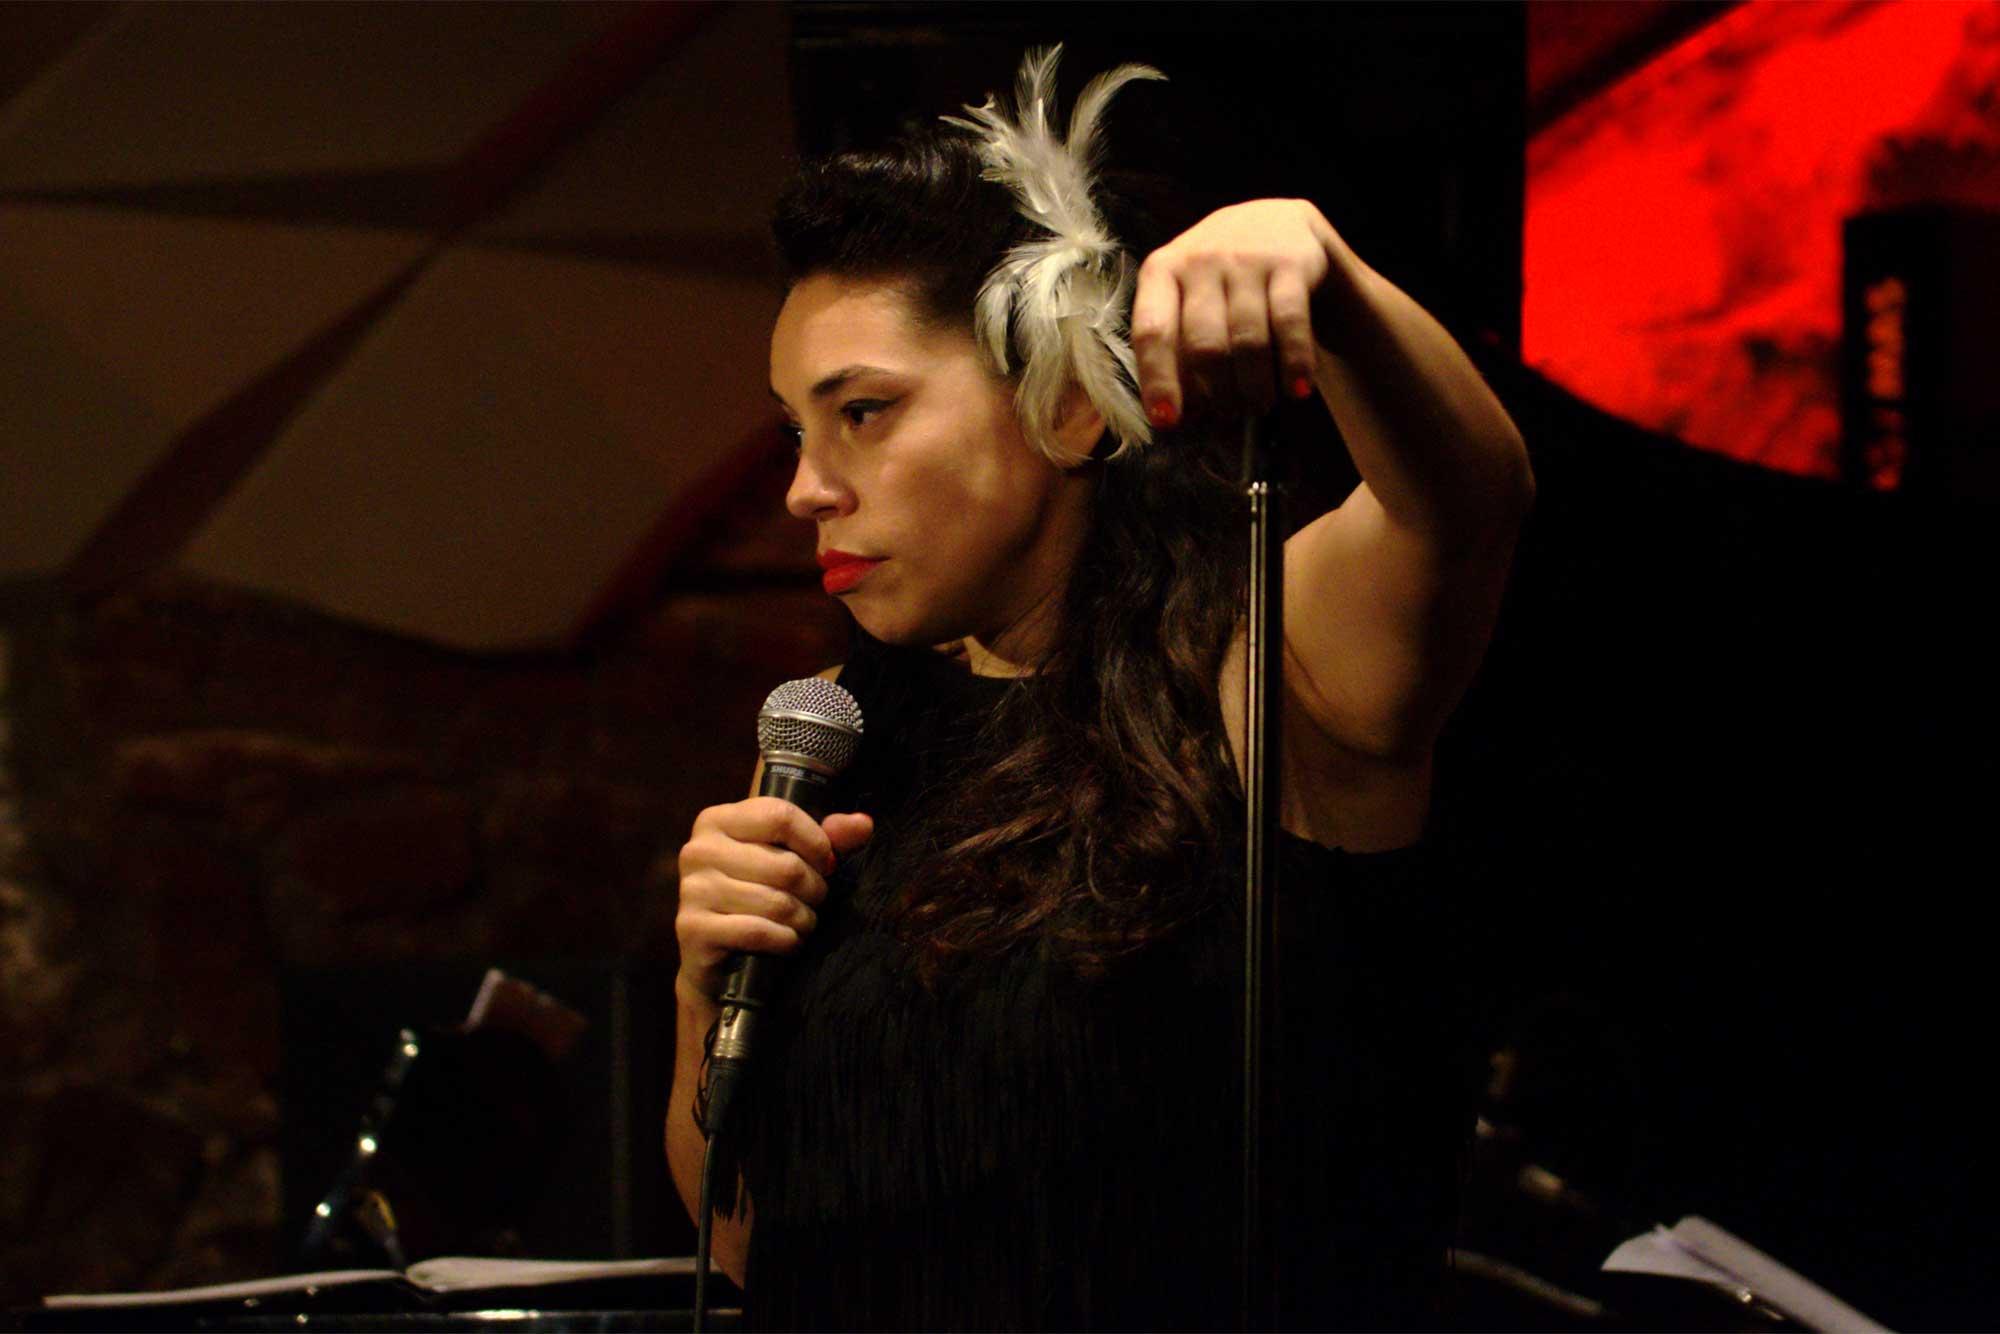 Festival de Jazz de Terrassa 2018: Donny McCaslin, Terence Blanchard, Uri Caine, Billy Branch...